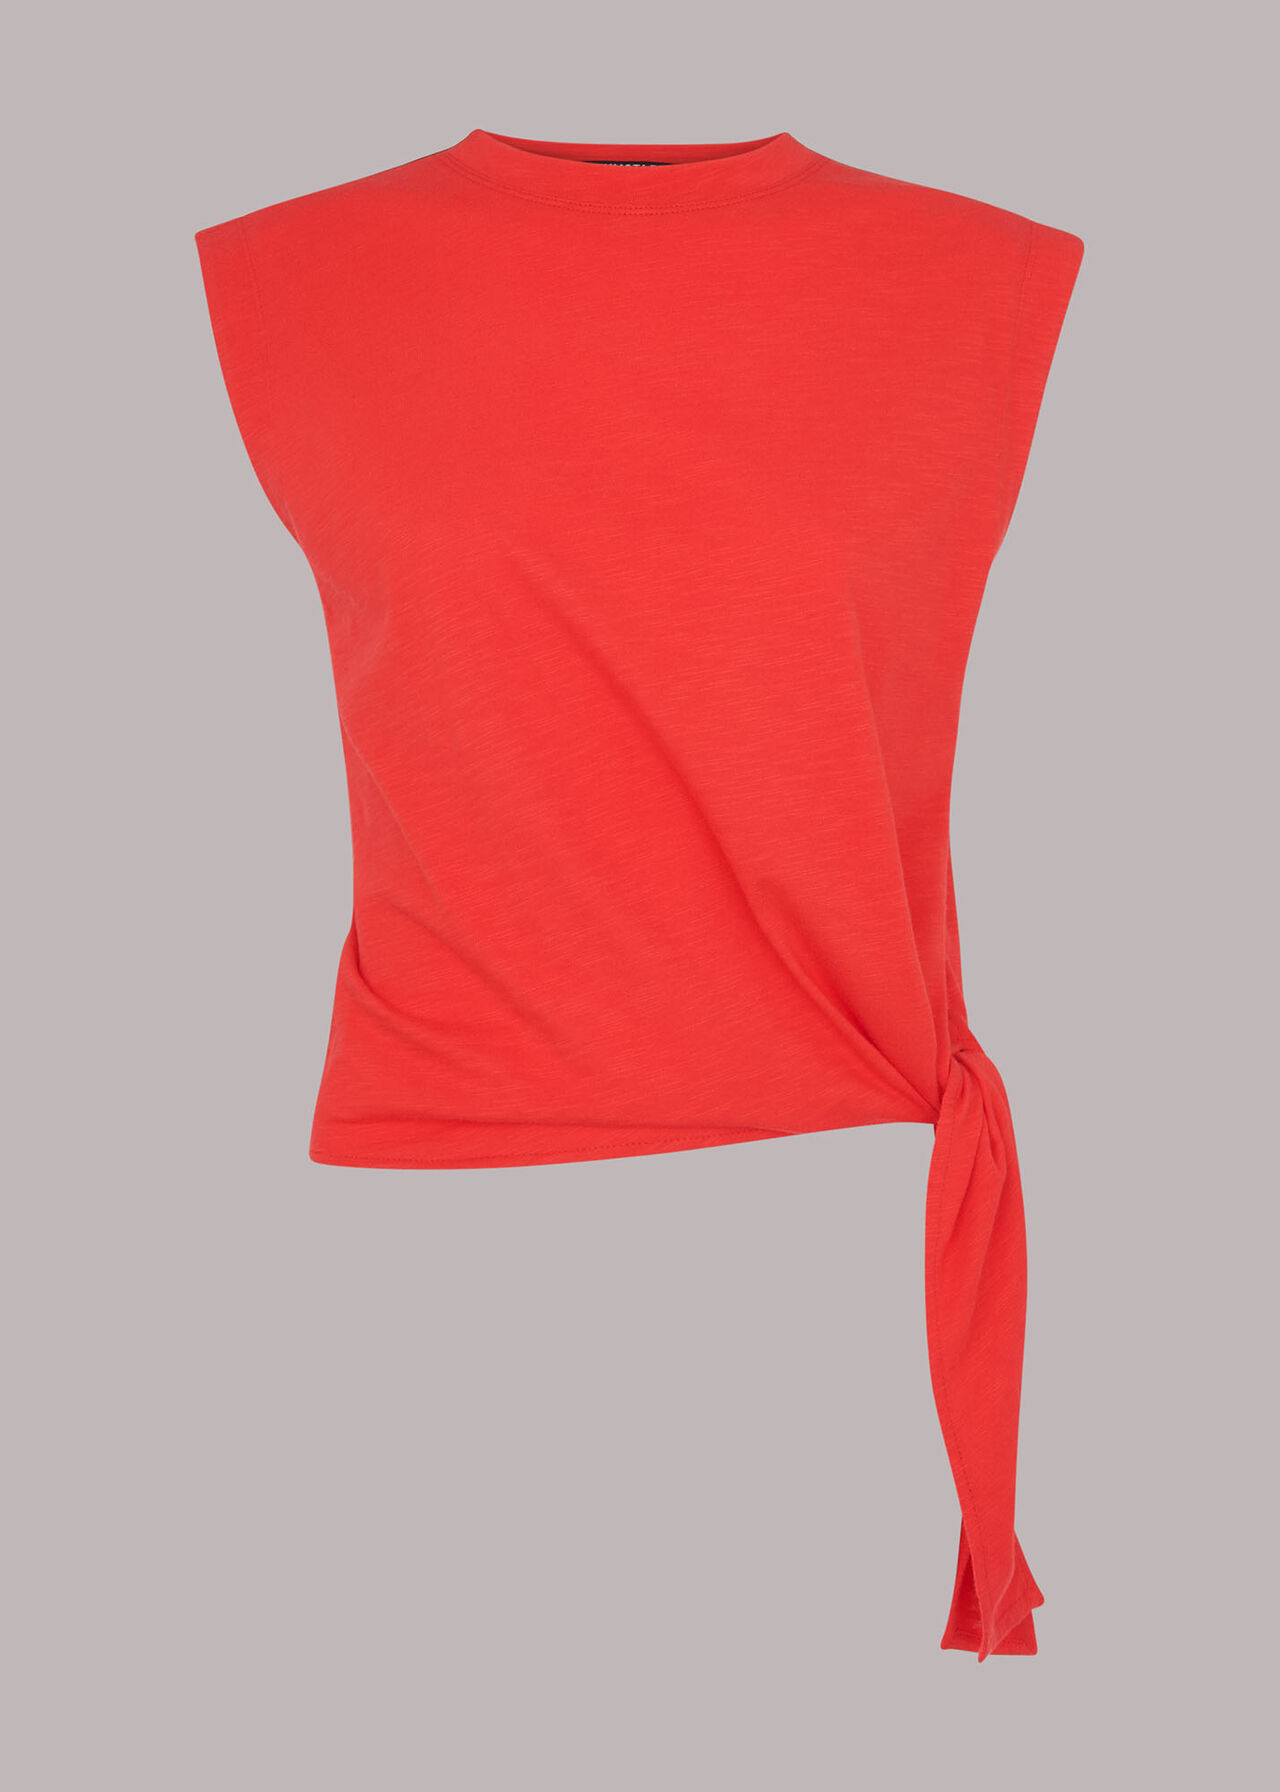 Sleeveless Tie Side Top